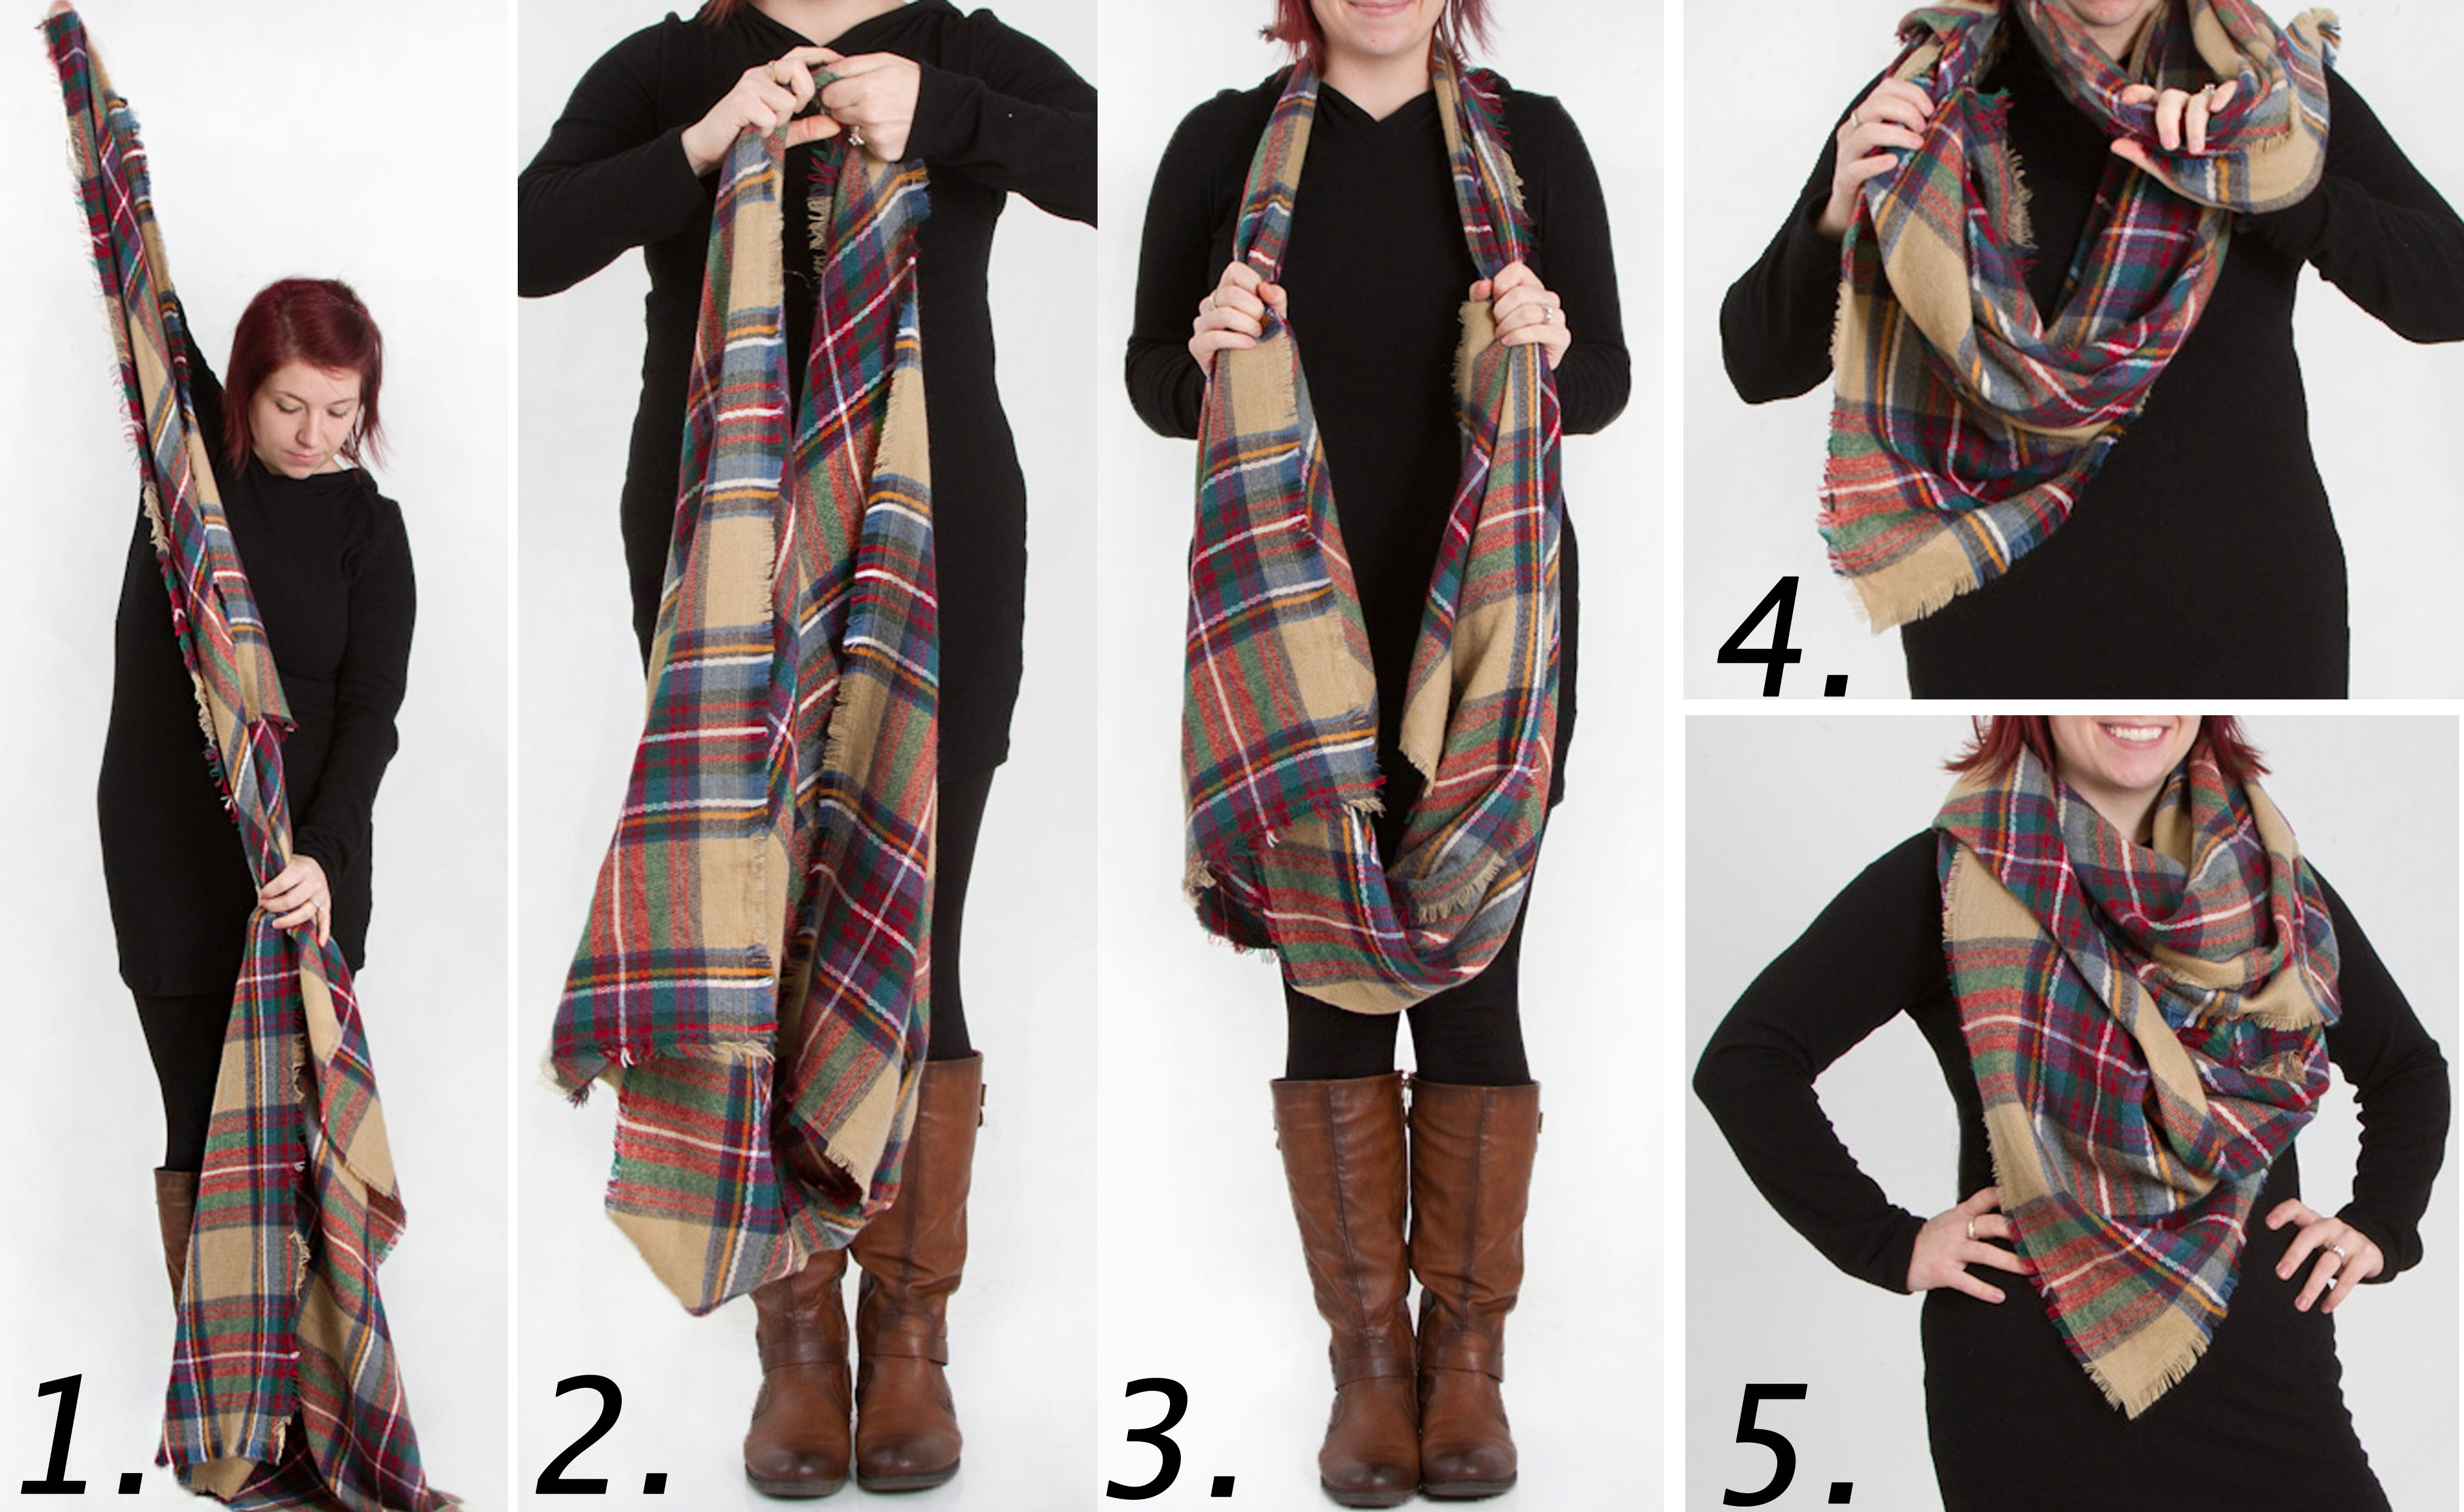 51cdf8111156 4 Ways to Wear a Blanket Scarf  Look By M Tartan Plaid Scarf from Gliks.com